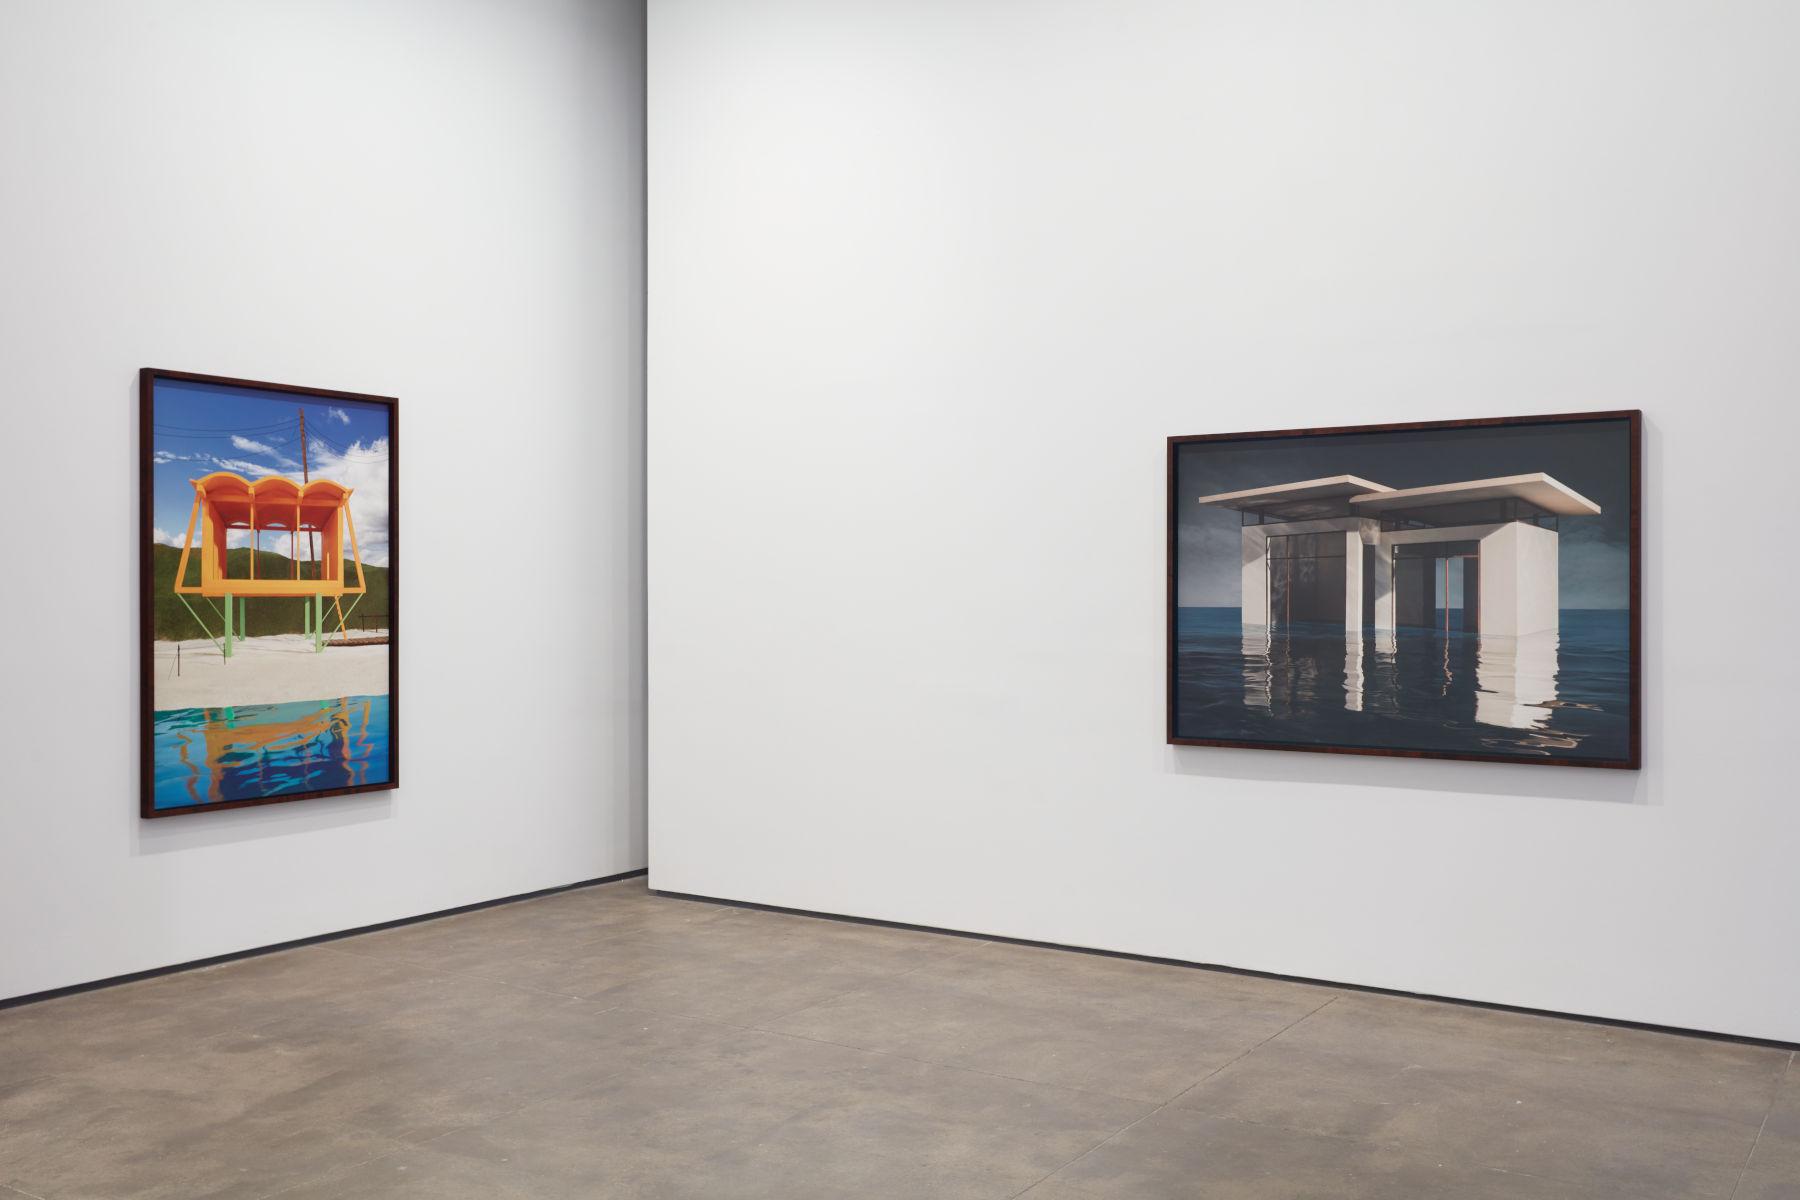 Sean Kelly Gallery James Casebere 1